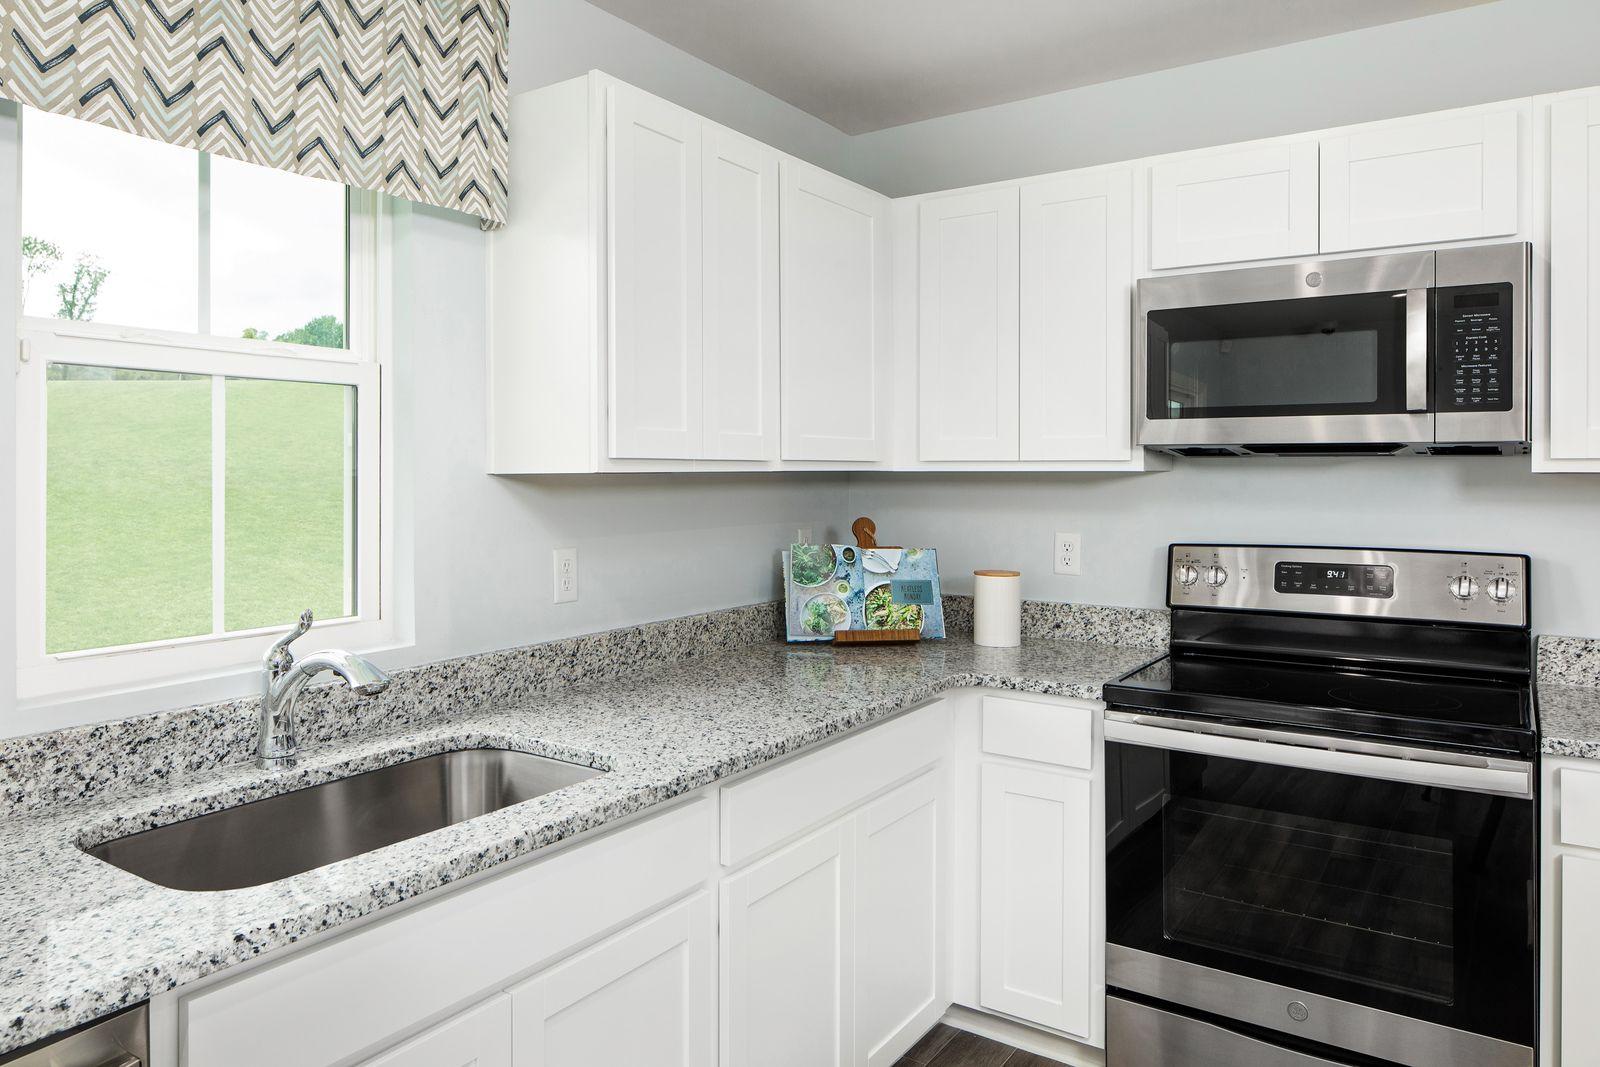 Kitchen featured in the Poplar By Ryan Homes in Nashville, TN